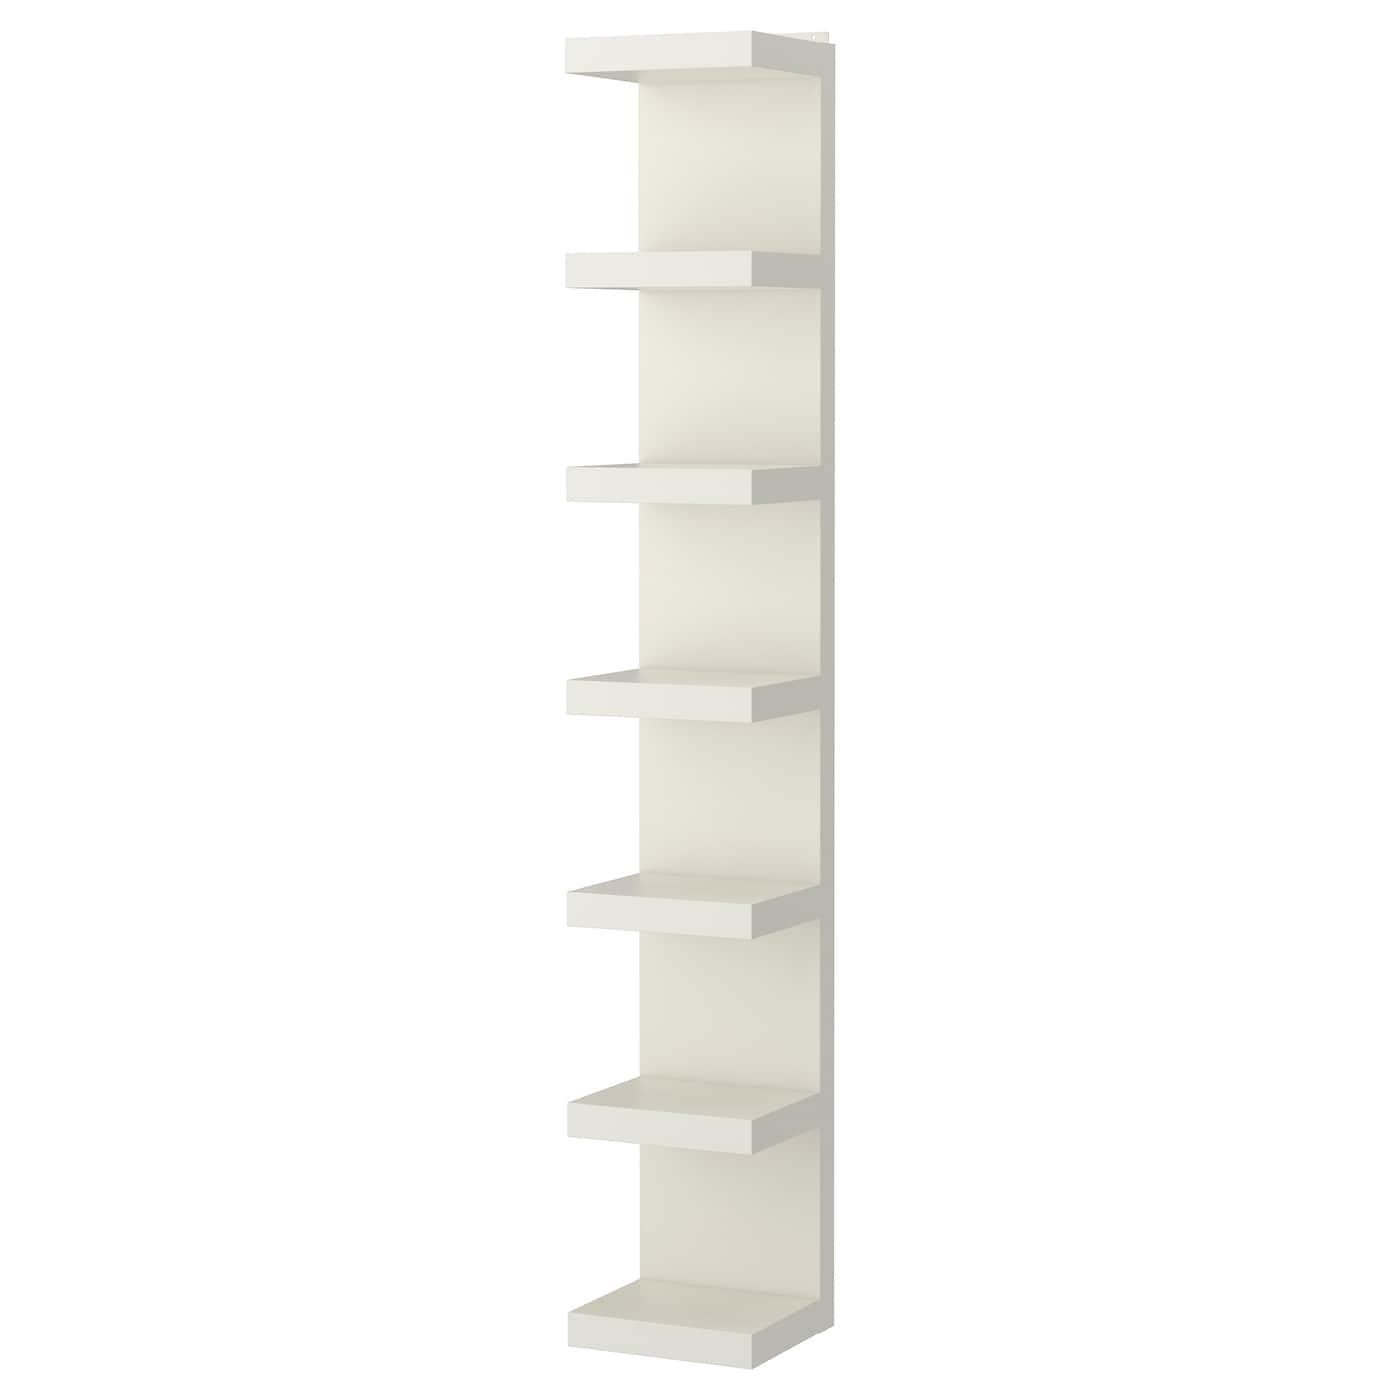 Wall Shelf Unit Lack White